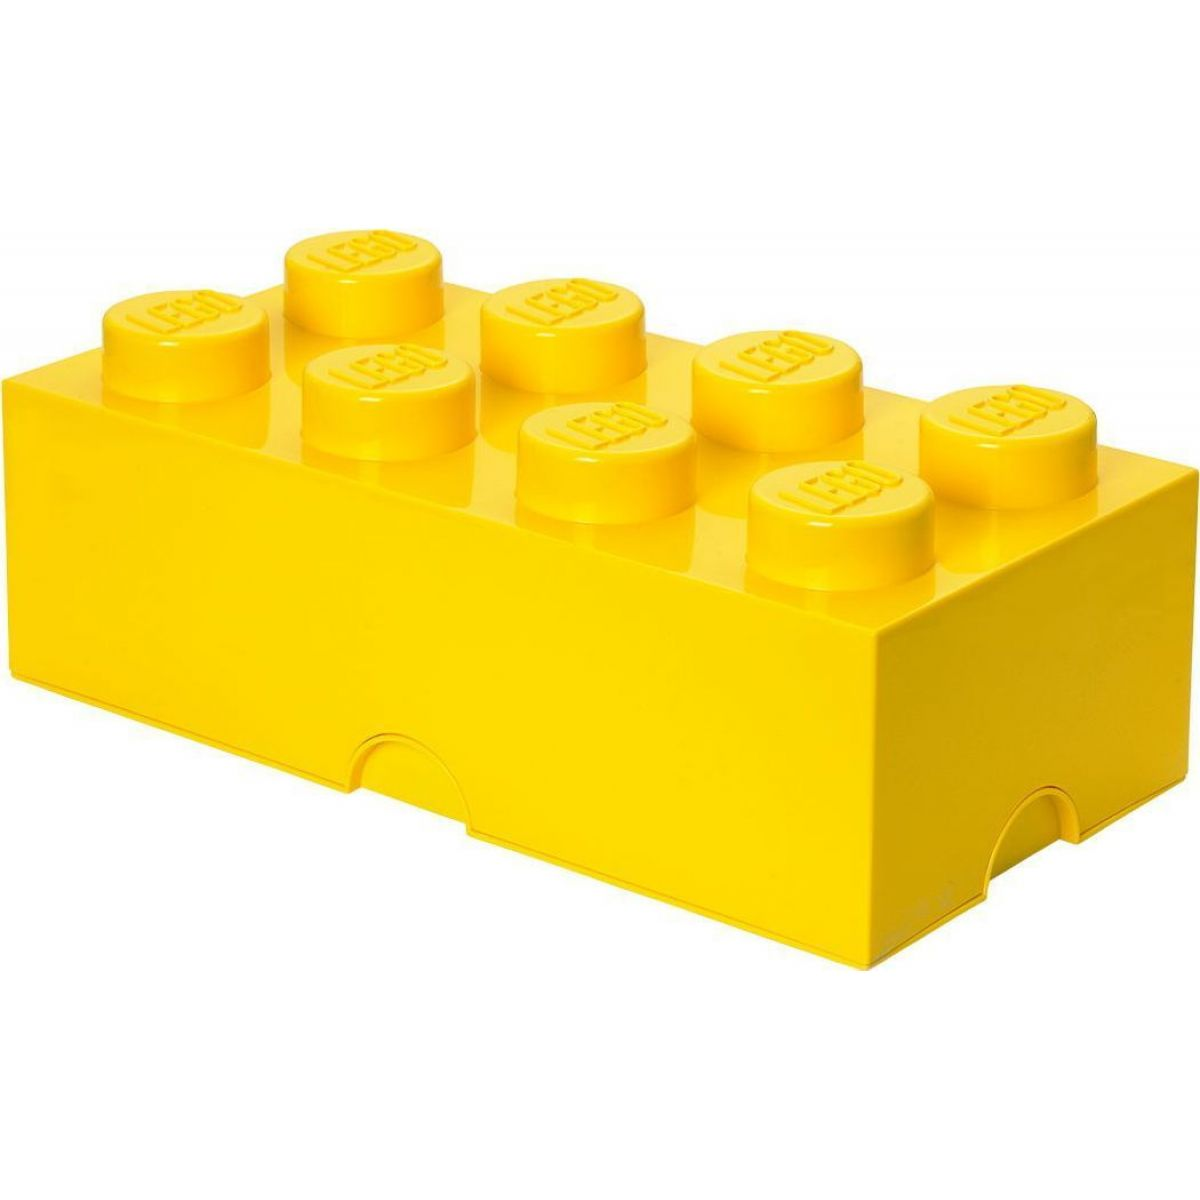 LEGO Úložný box 25x50x18cm Žlutá - Poškozený obal